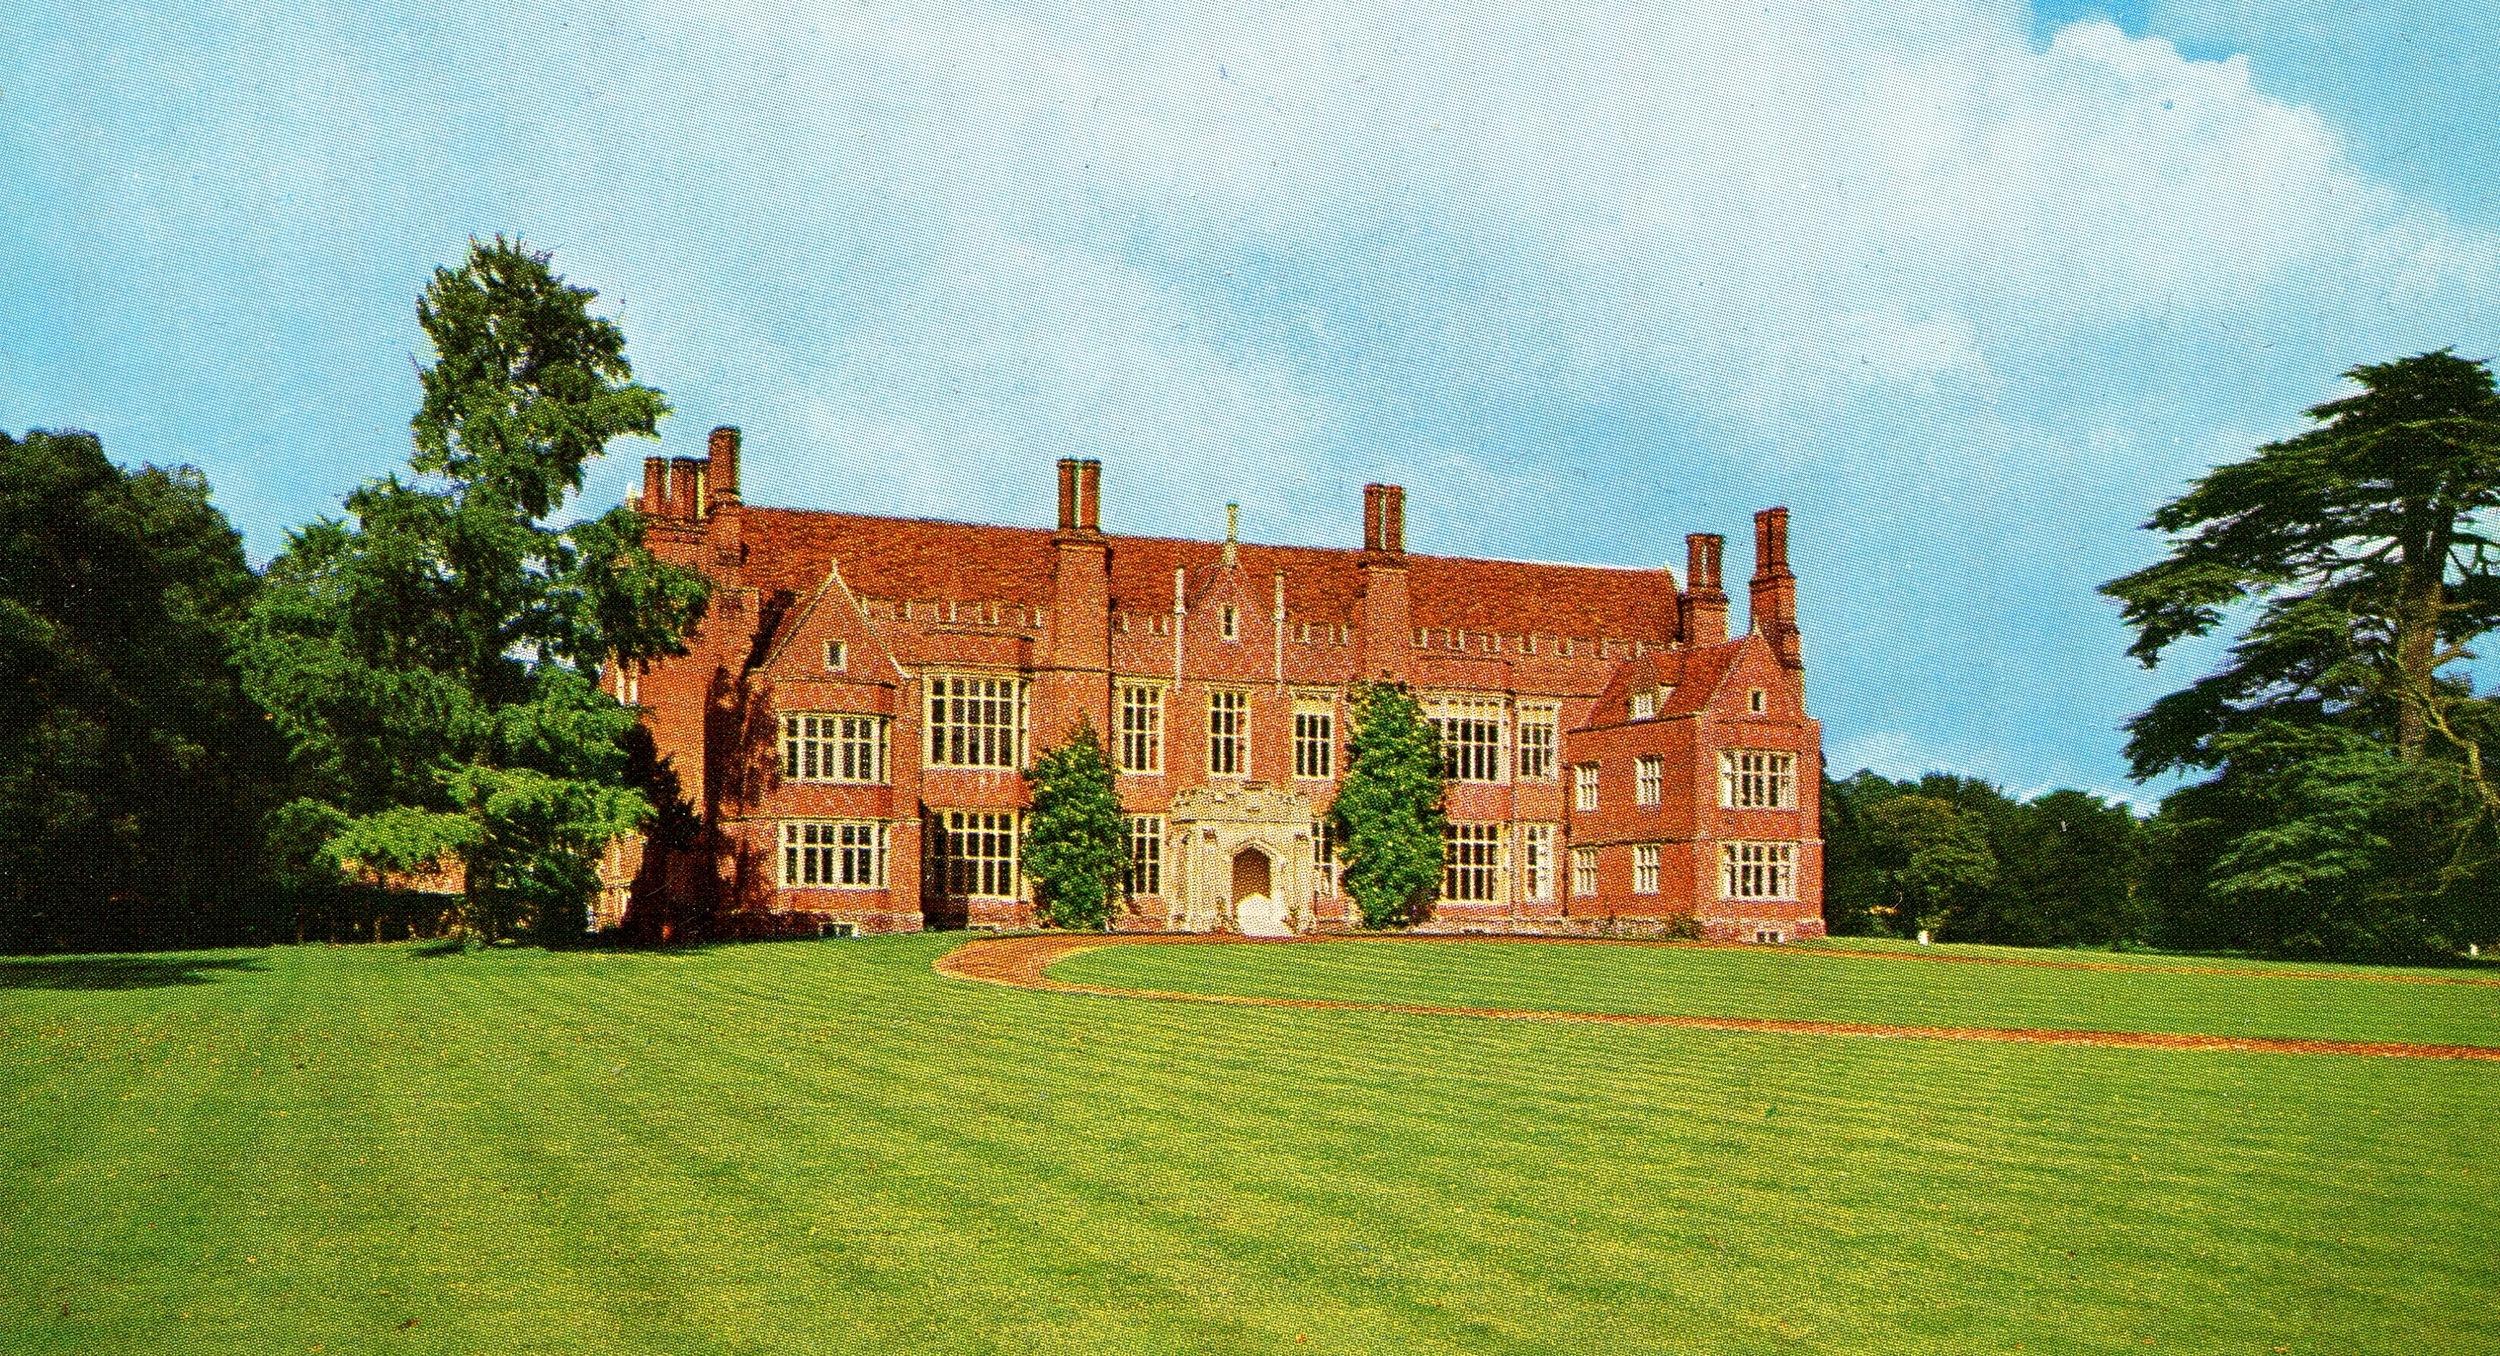 Mapledurham House, England